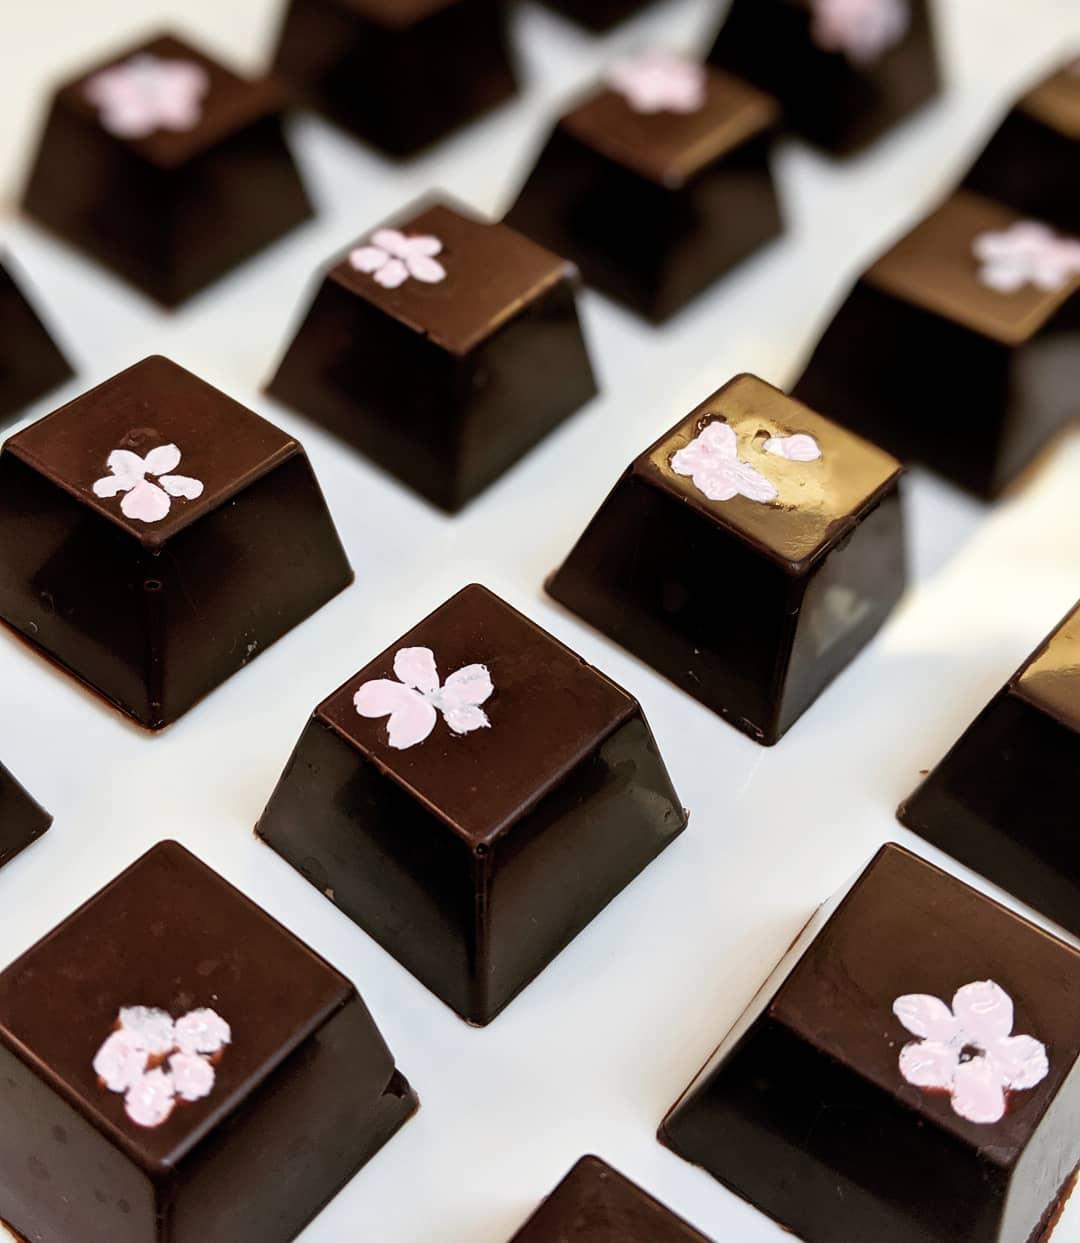 chocolate_manor_72201781_128268771904010